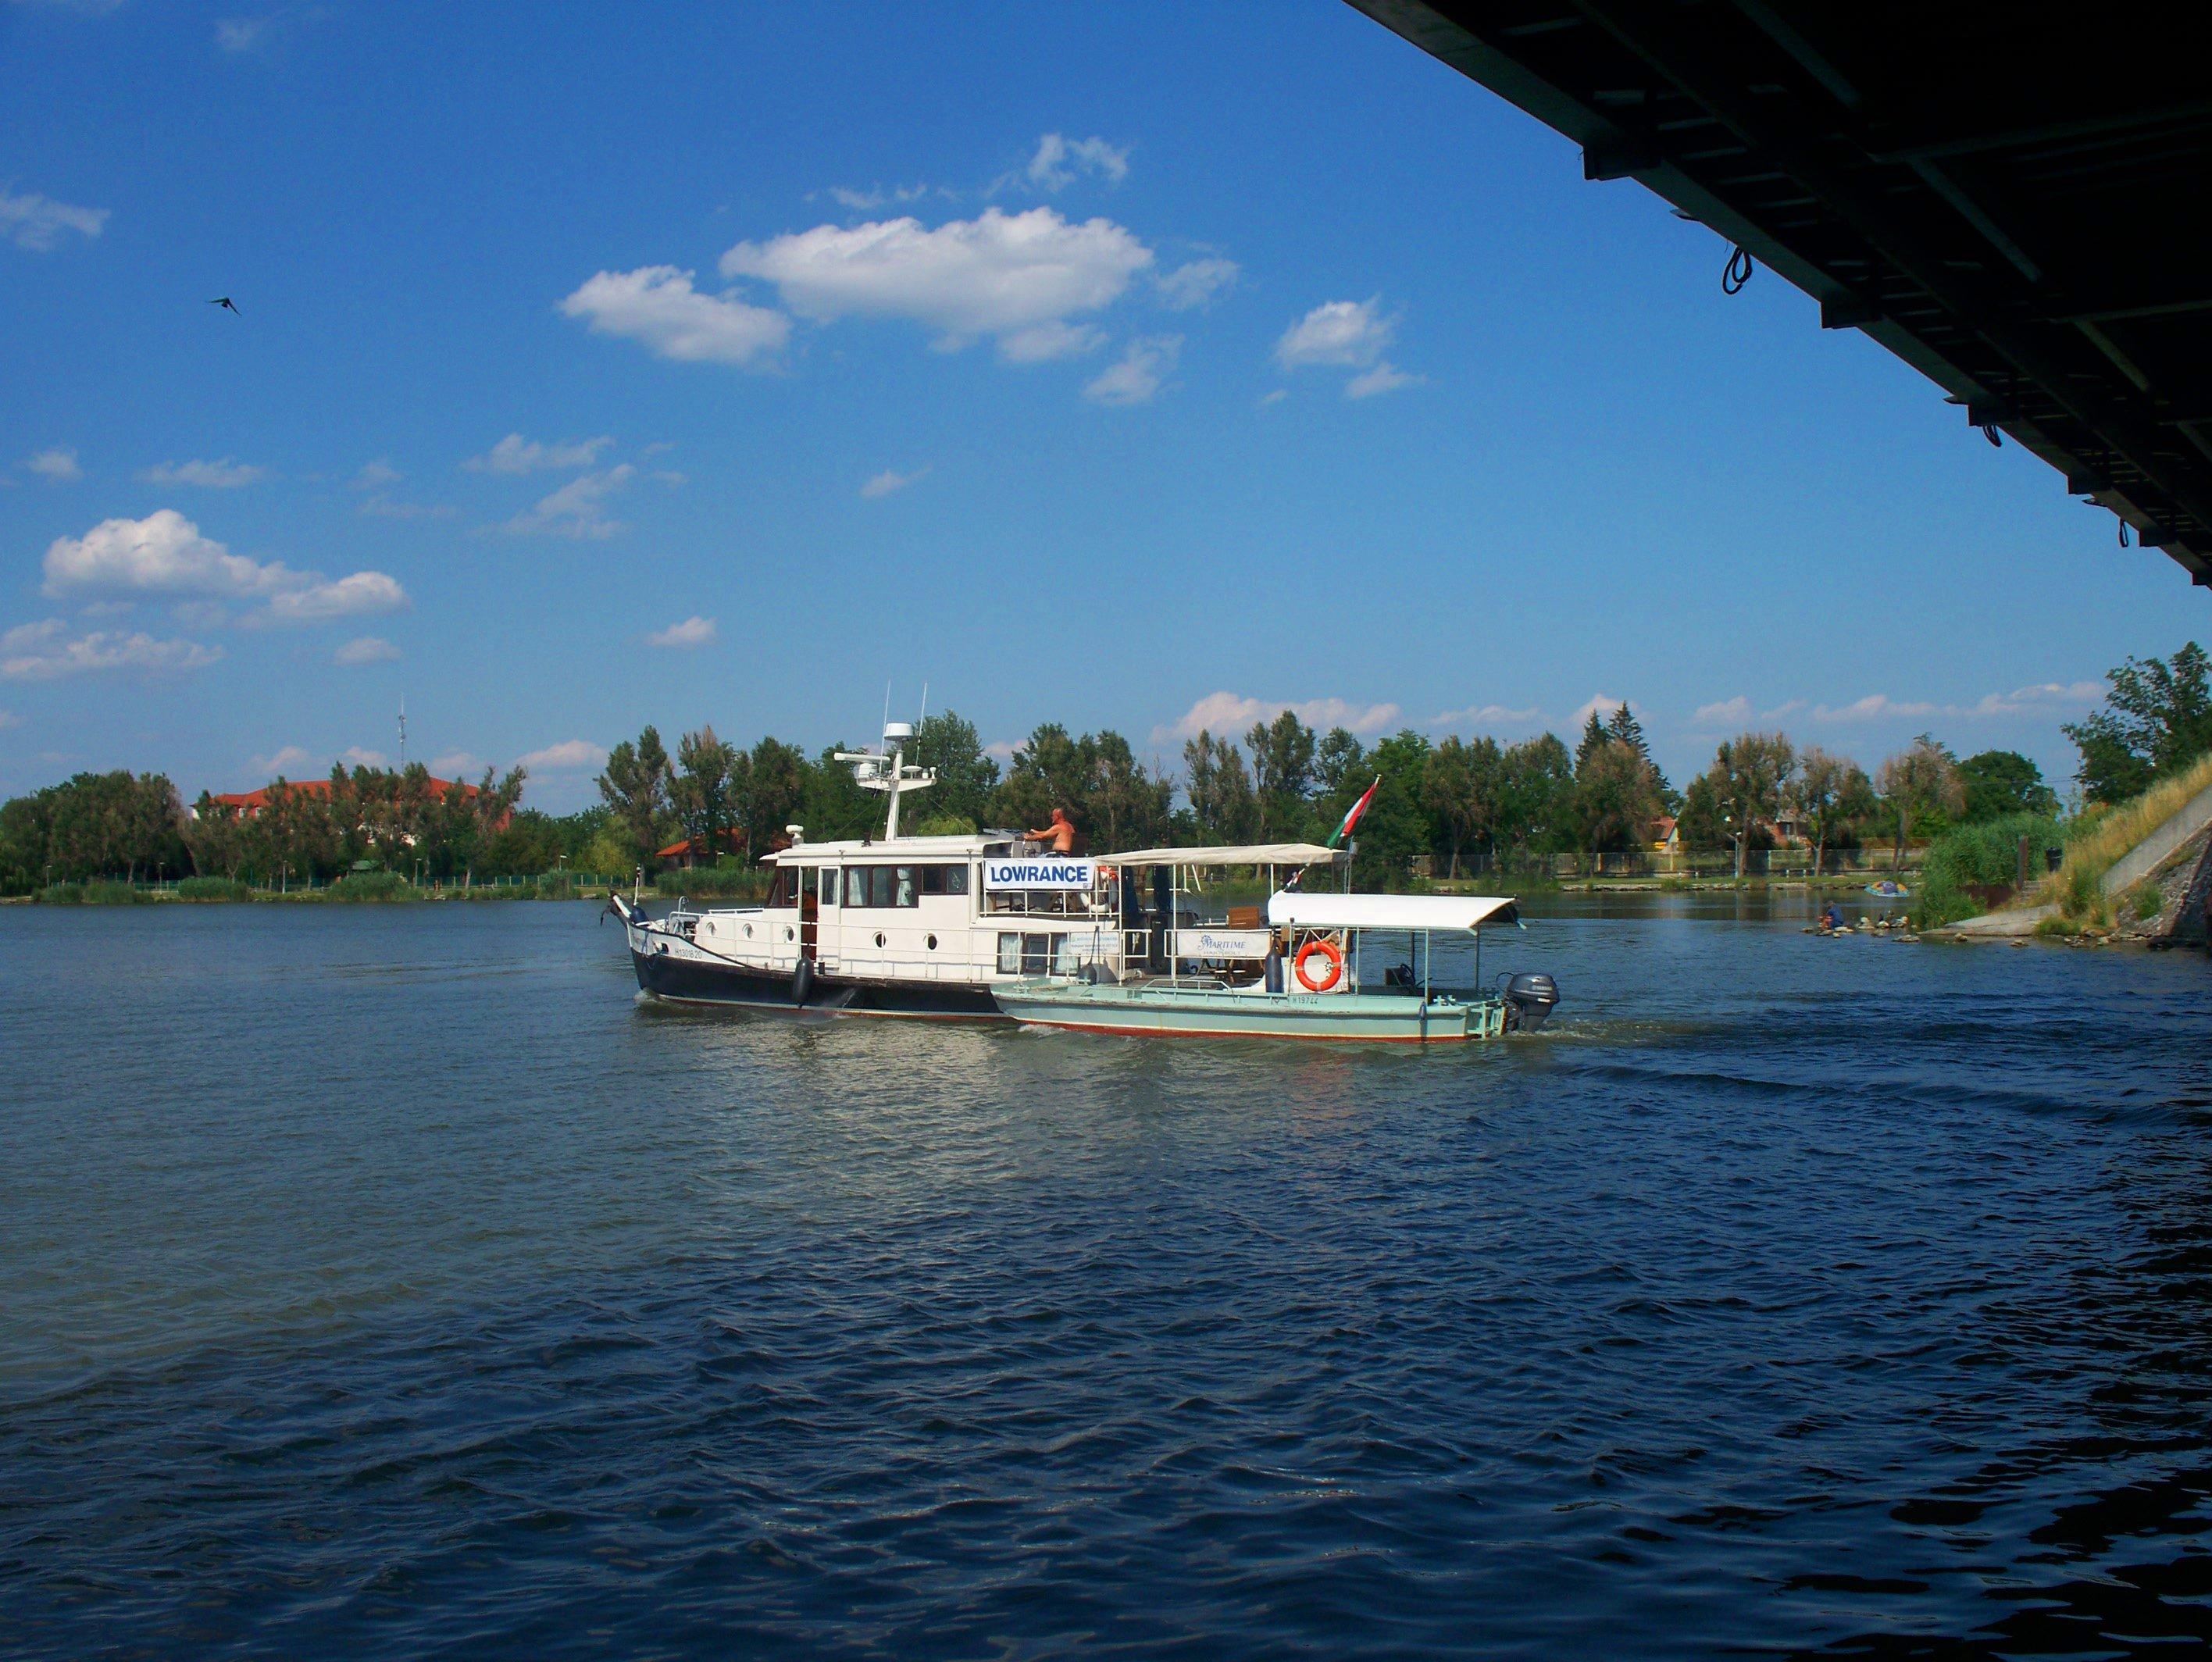 http://www.kisdunainagyhajok.hu/egyebhajok/2012_06_24_maritime_motoros_vontatohajo_a_rackevei-hidnal/2012_06_24_maritime_motoros_vontatohajo_a_rackevei-hidnal_008.jpg